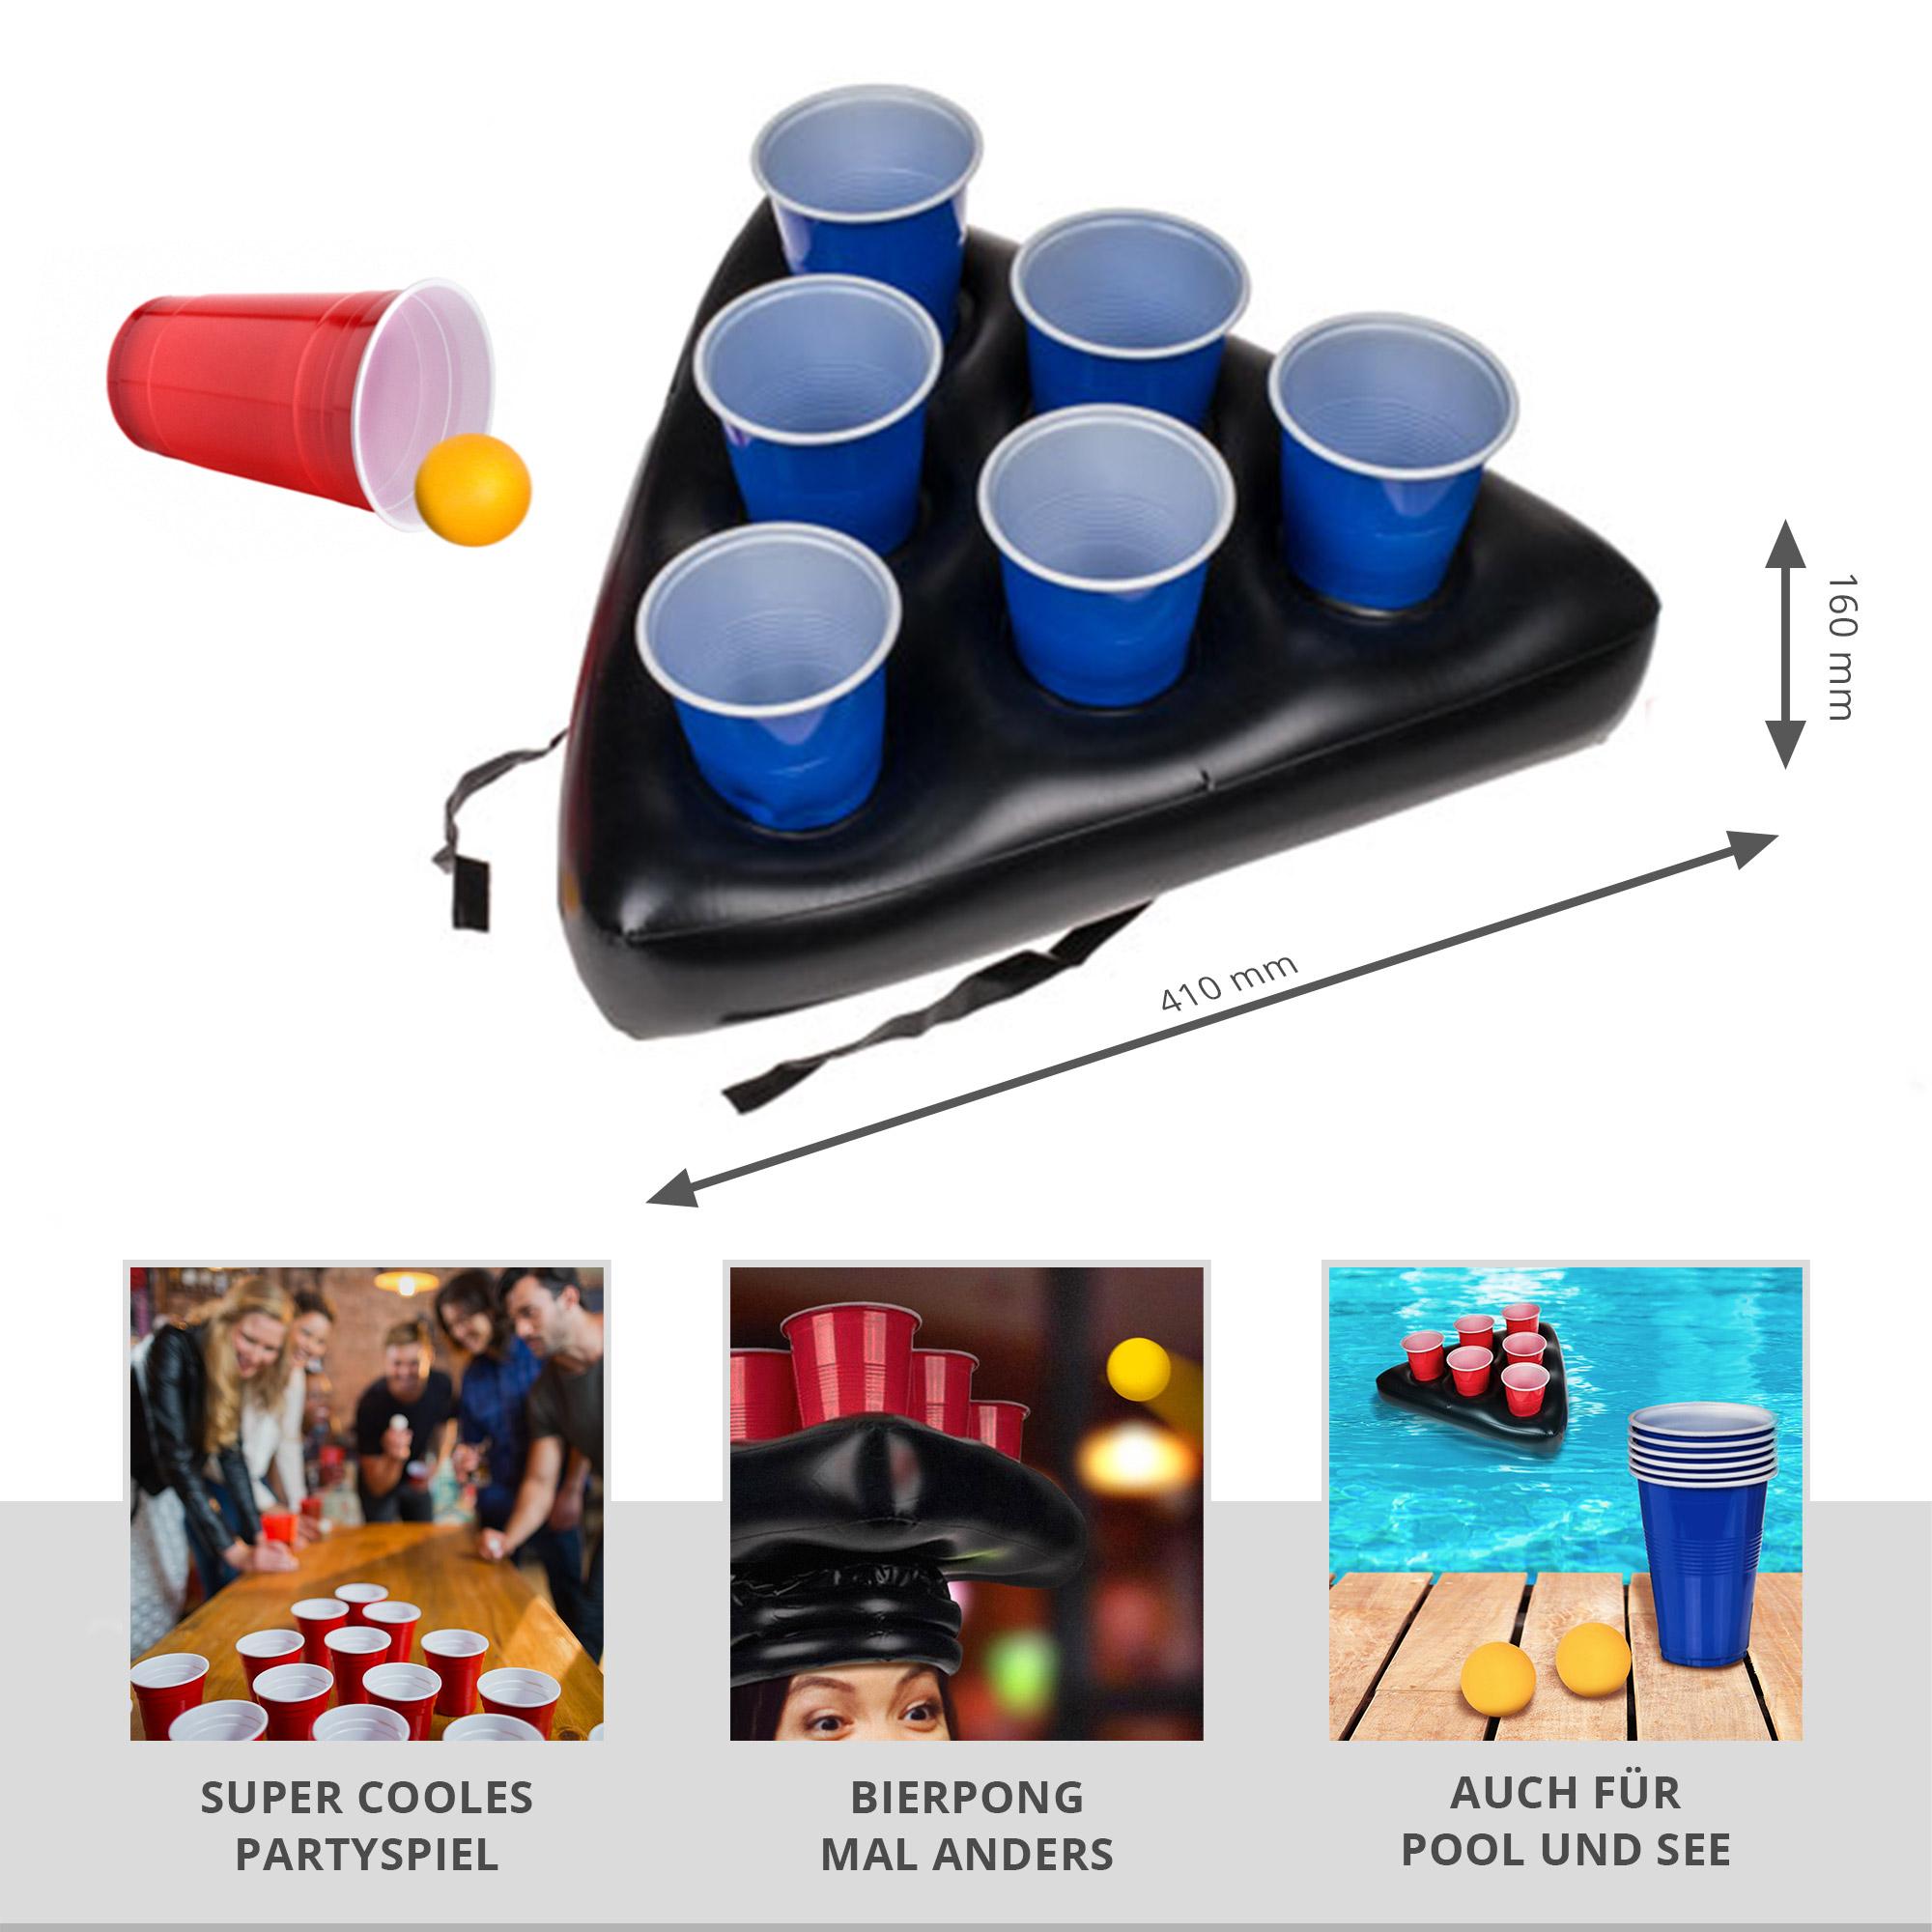 Aufblasbarer Bierpong Hut - Mini Beer Pong Set - 2